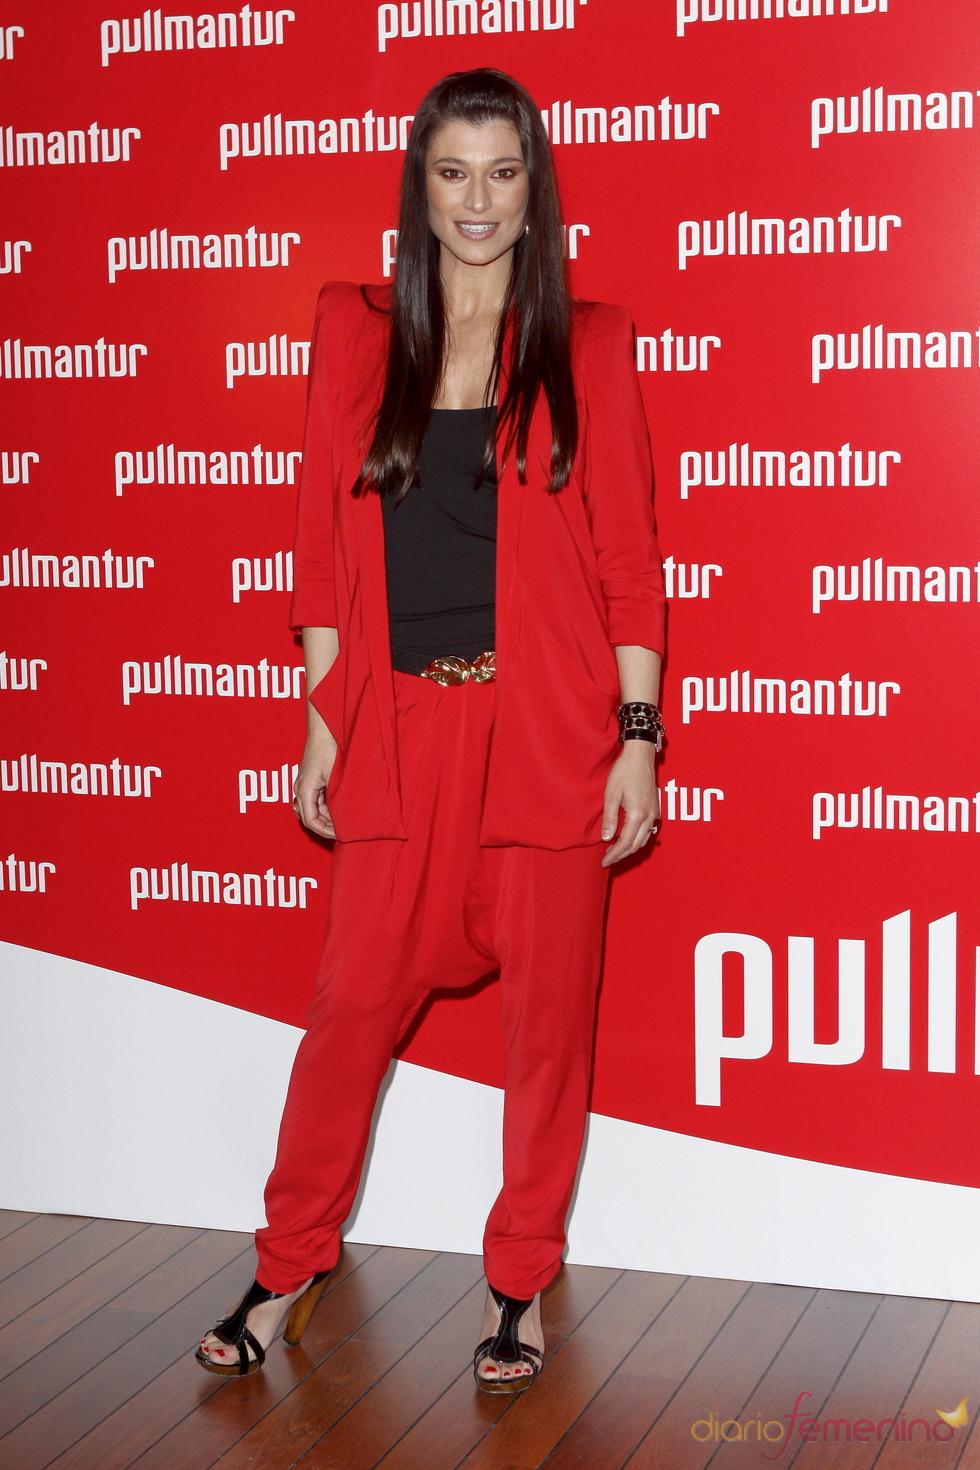 Sonia Ferrer posa a su llegada a la fiesta 'Pullmantur'